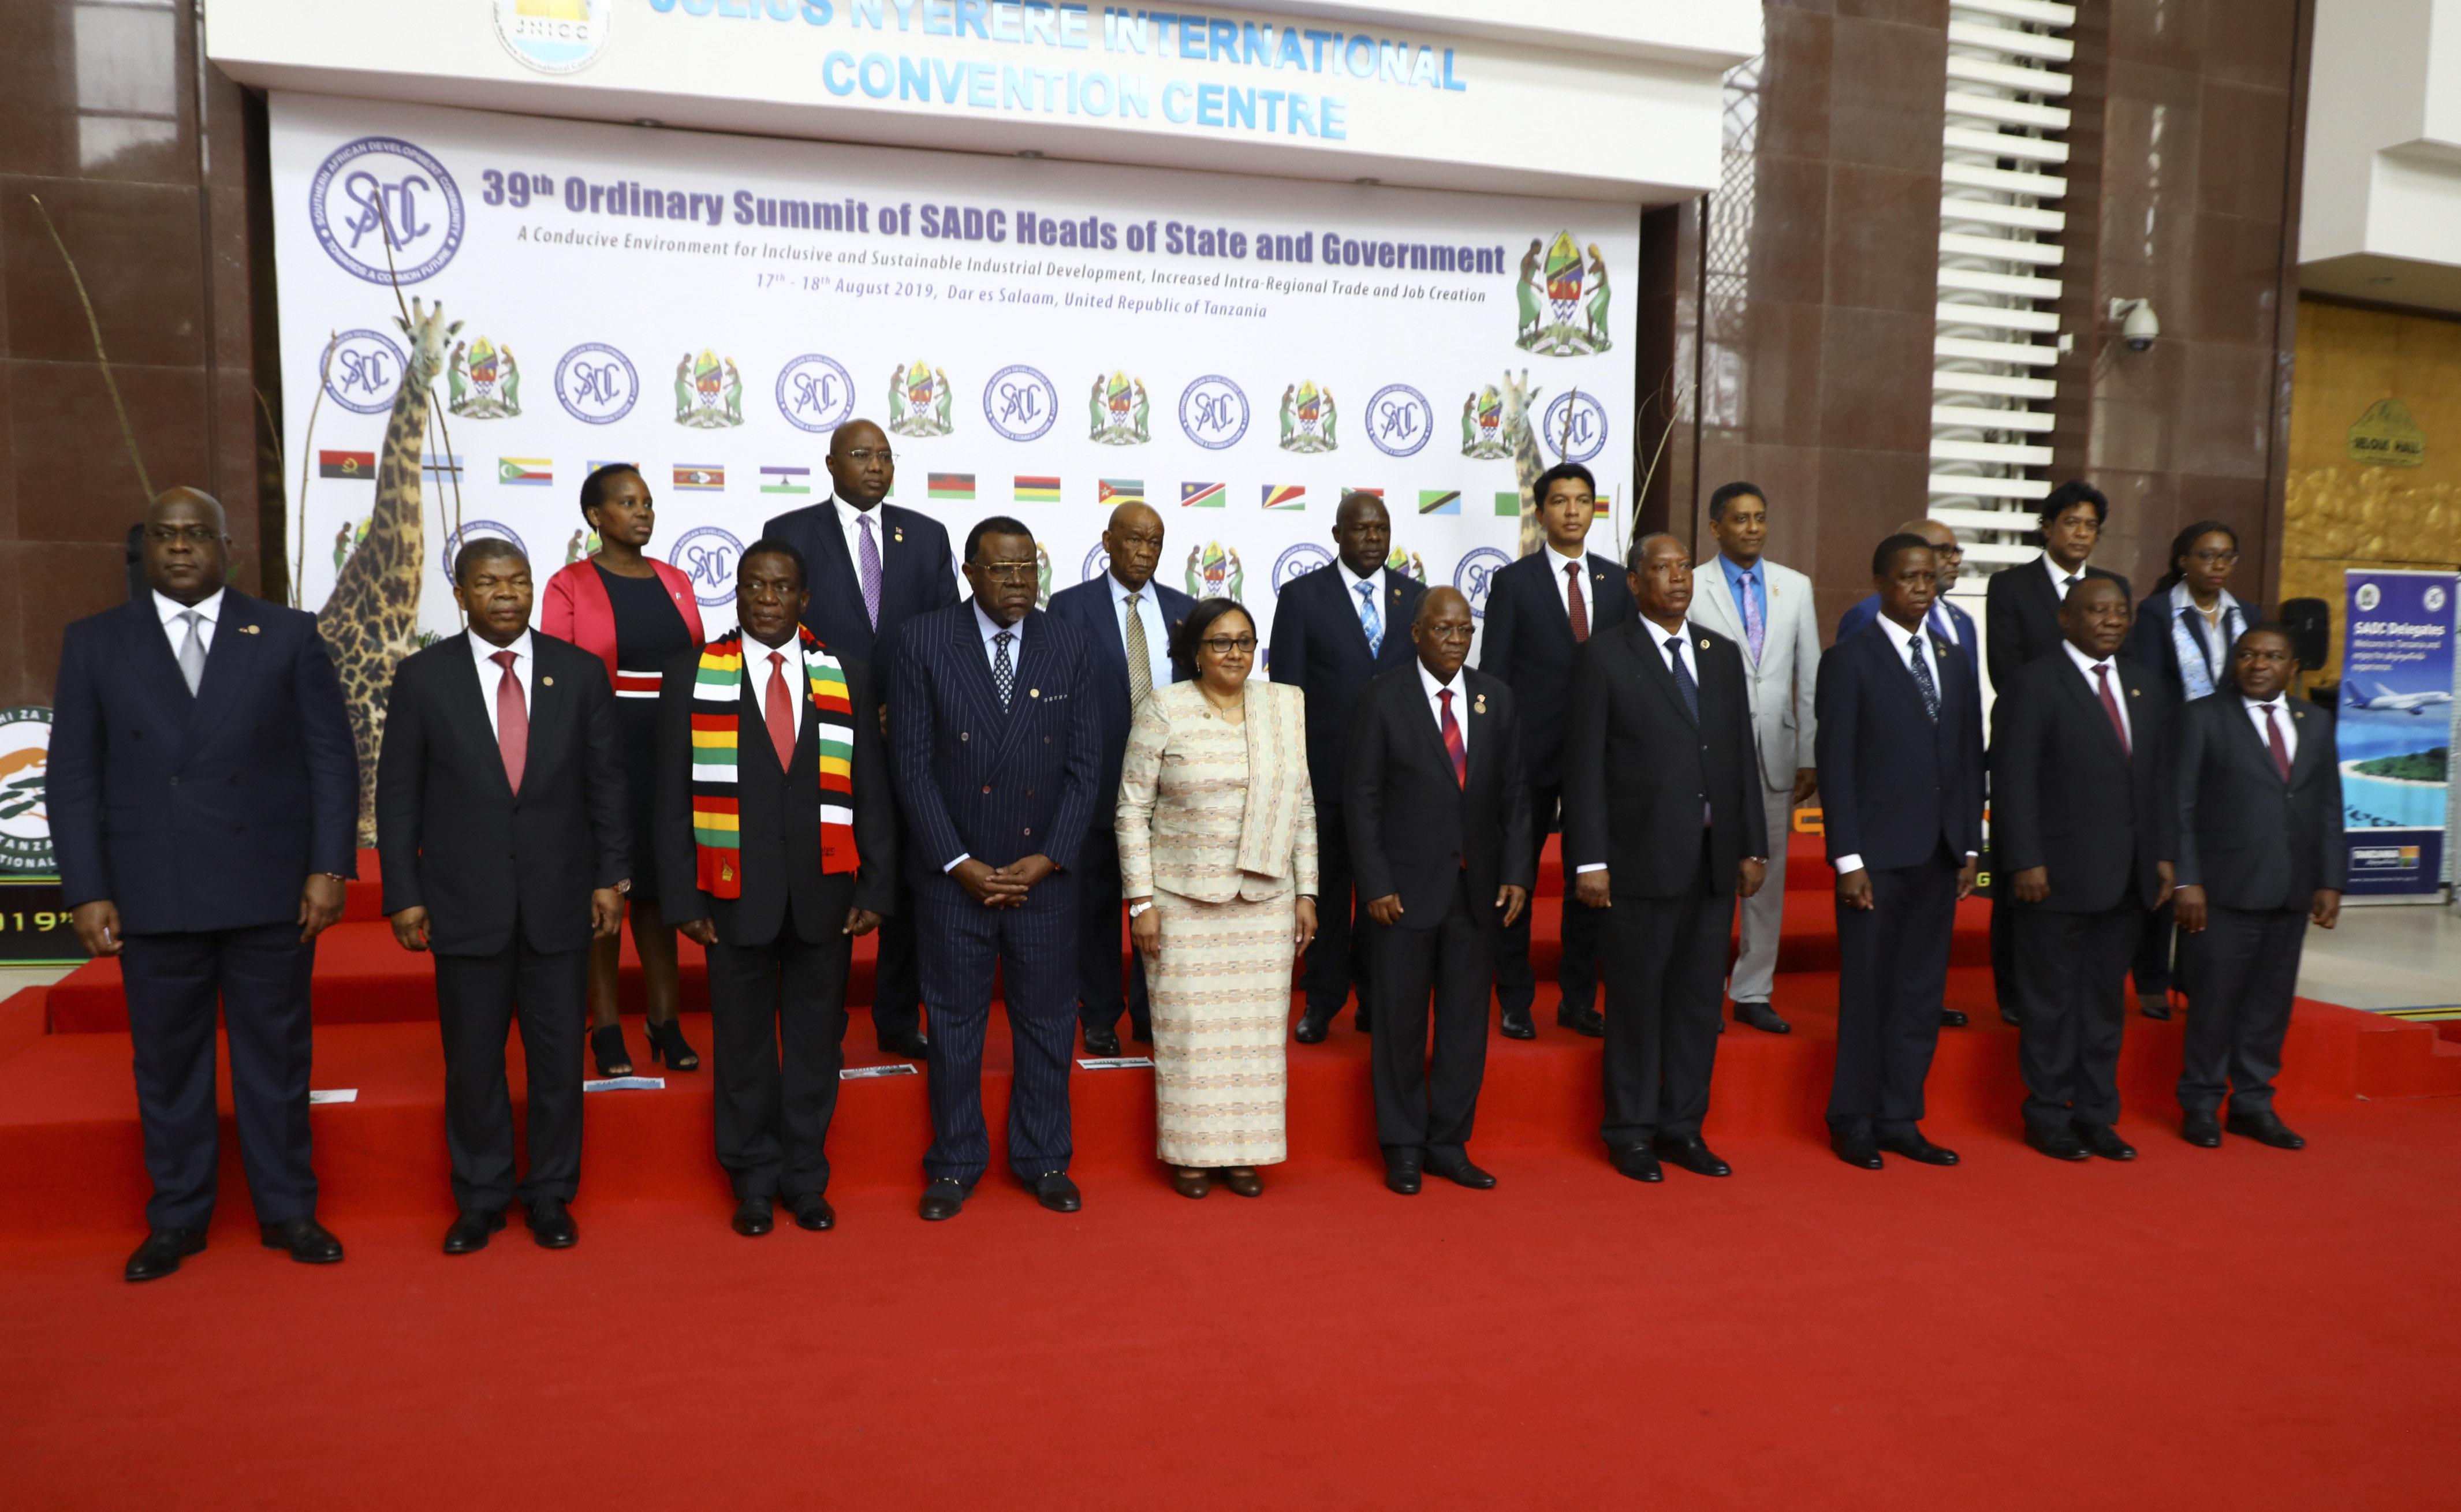 SADC leaders agree to address rising security threats - Xinhua   English.news.cn